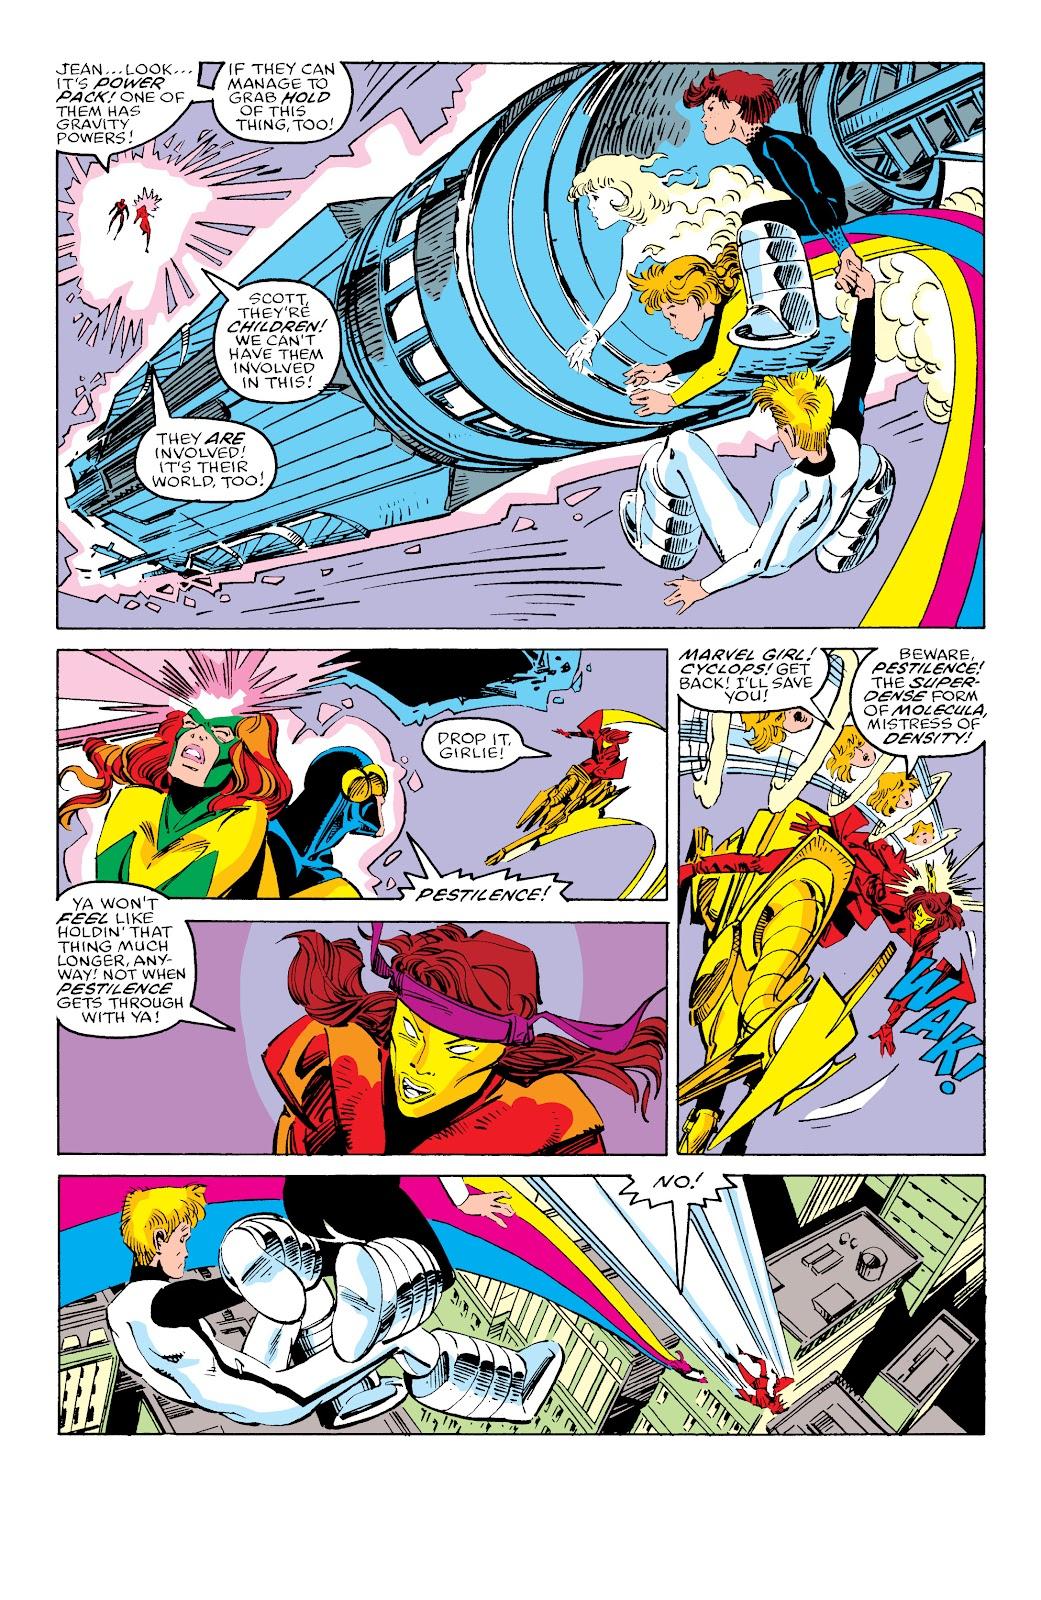 Read online X-Men Milestones: Fall of the Mutants comic -  Issue # TPB (Part 3) - 27